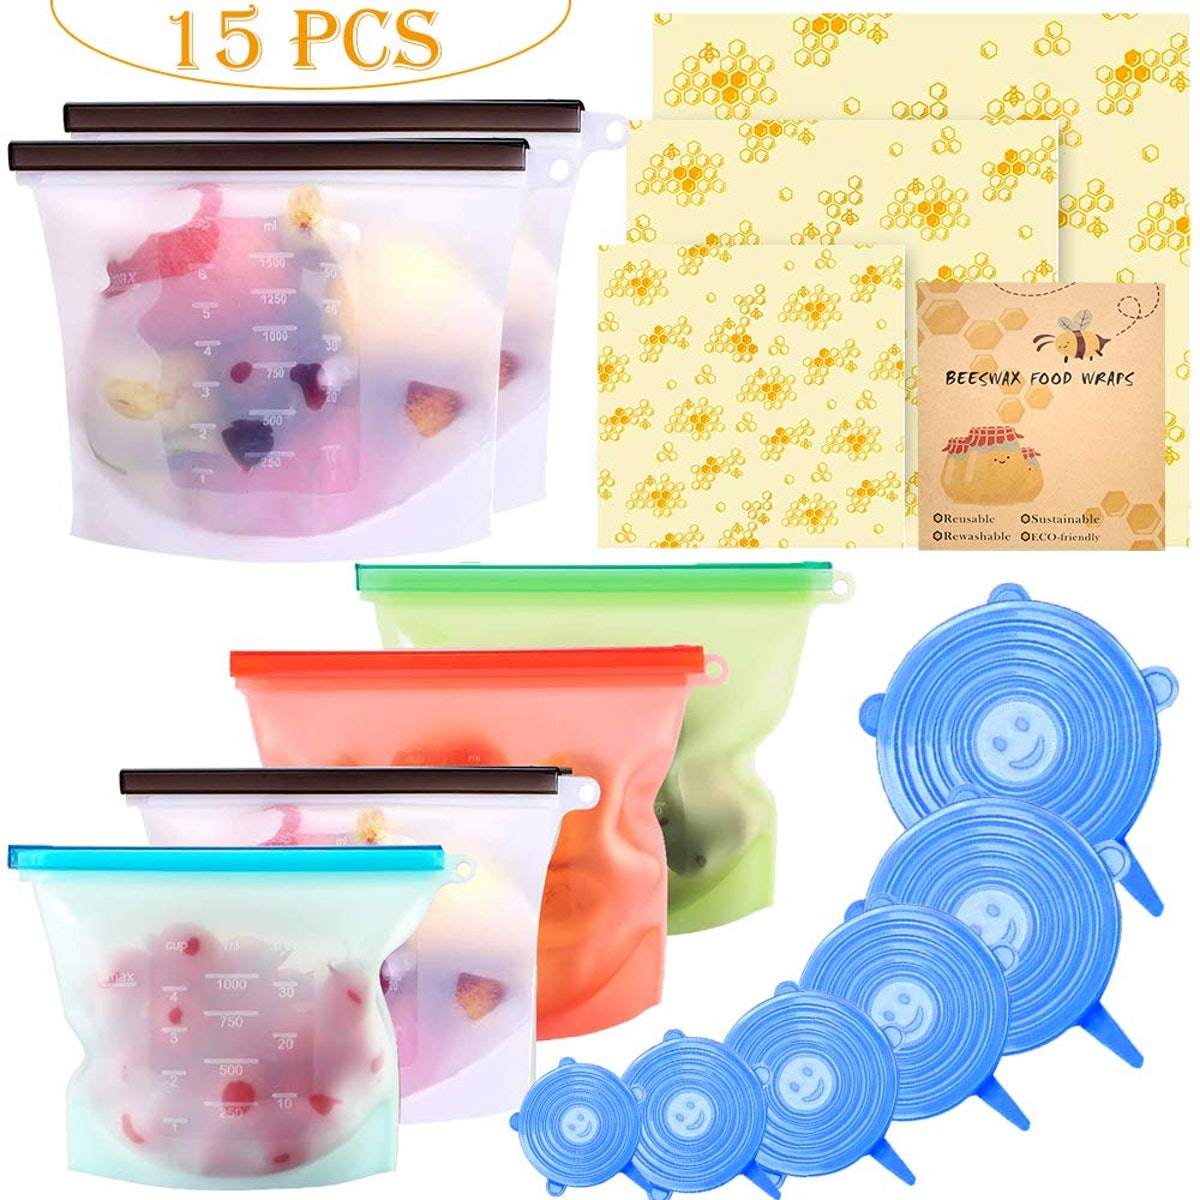 Alpacasso Silicone Food Storage Bags (15-Piece Set)